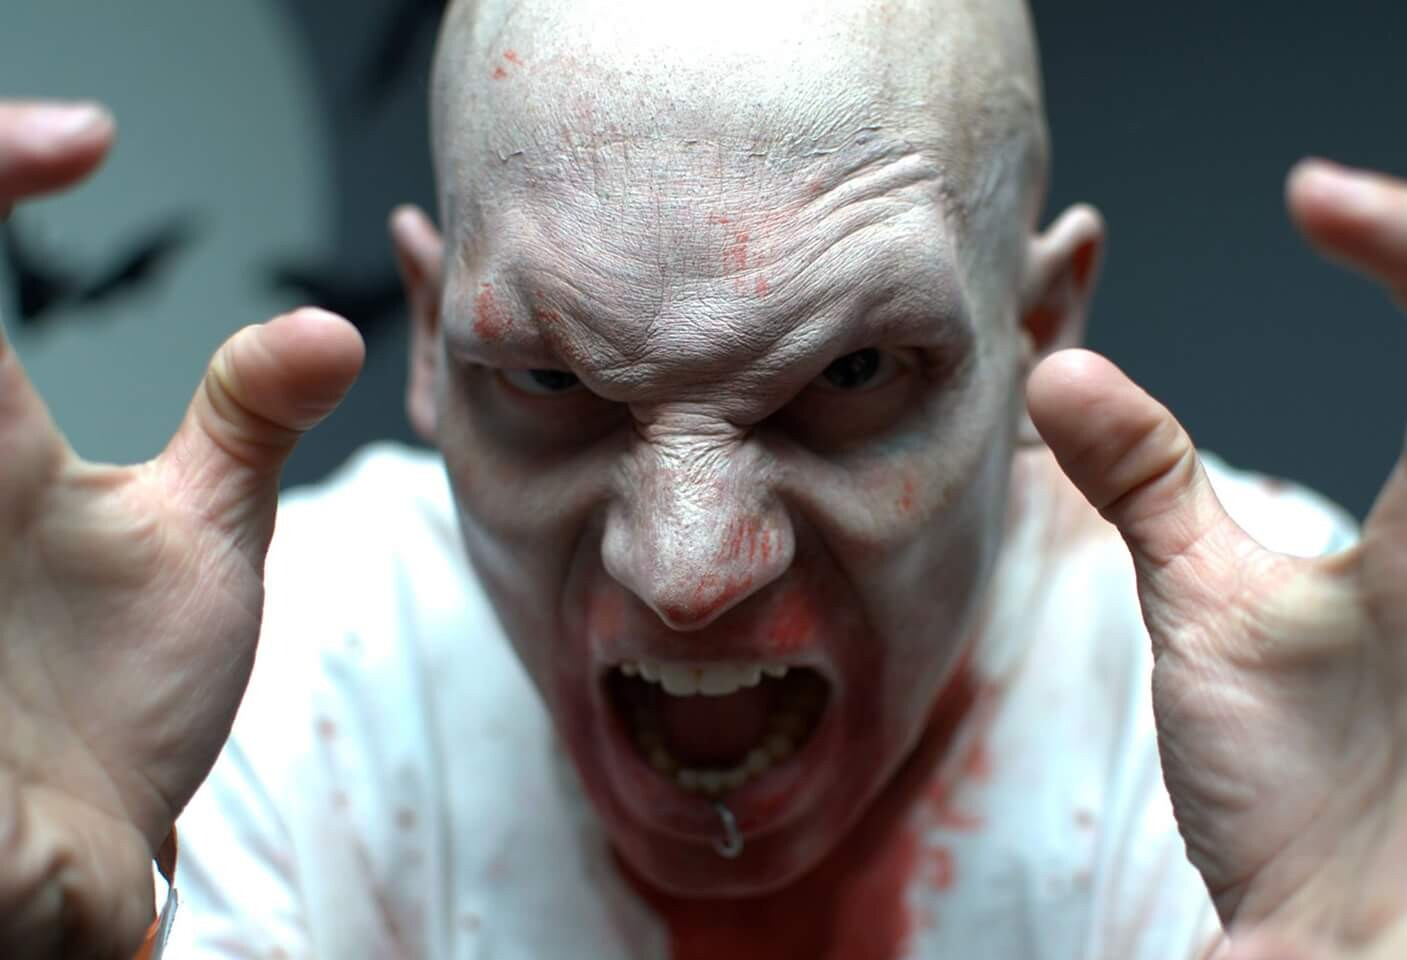 Demon Prosthetic Make-ups